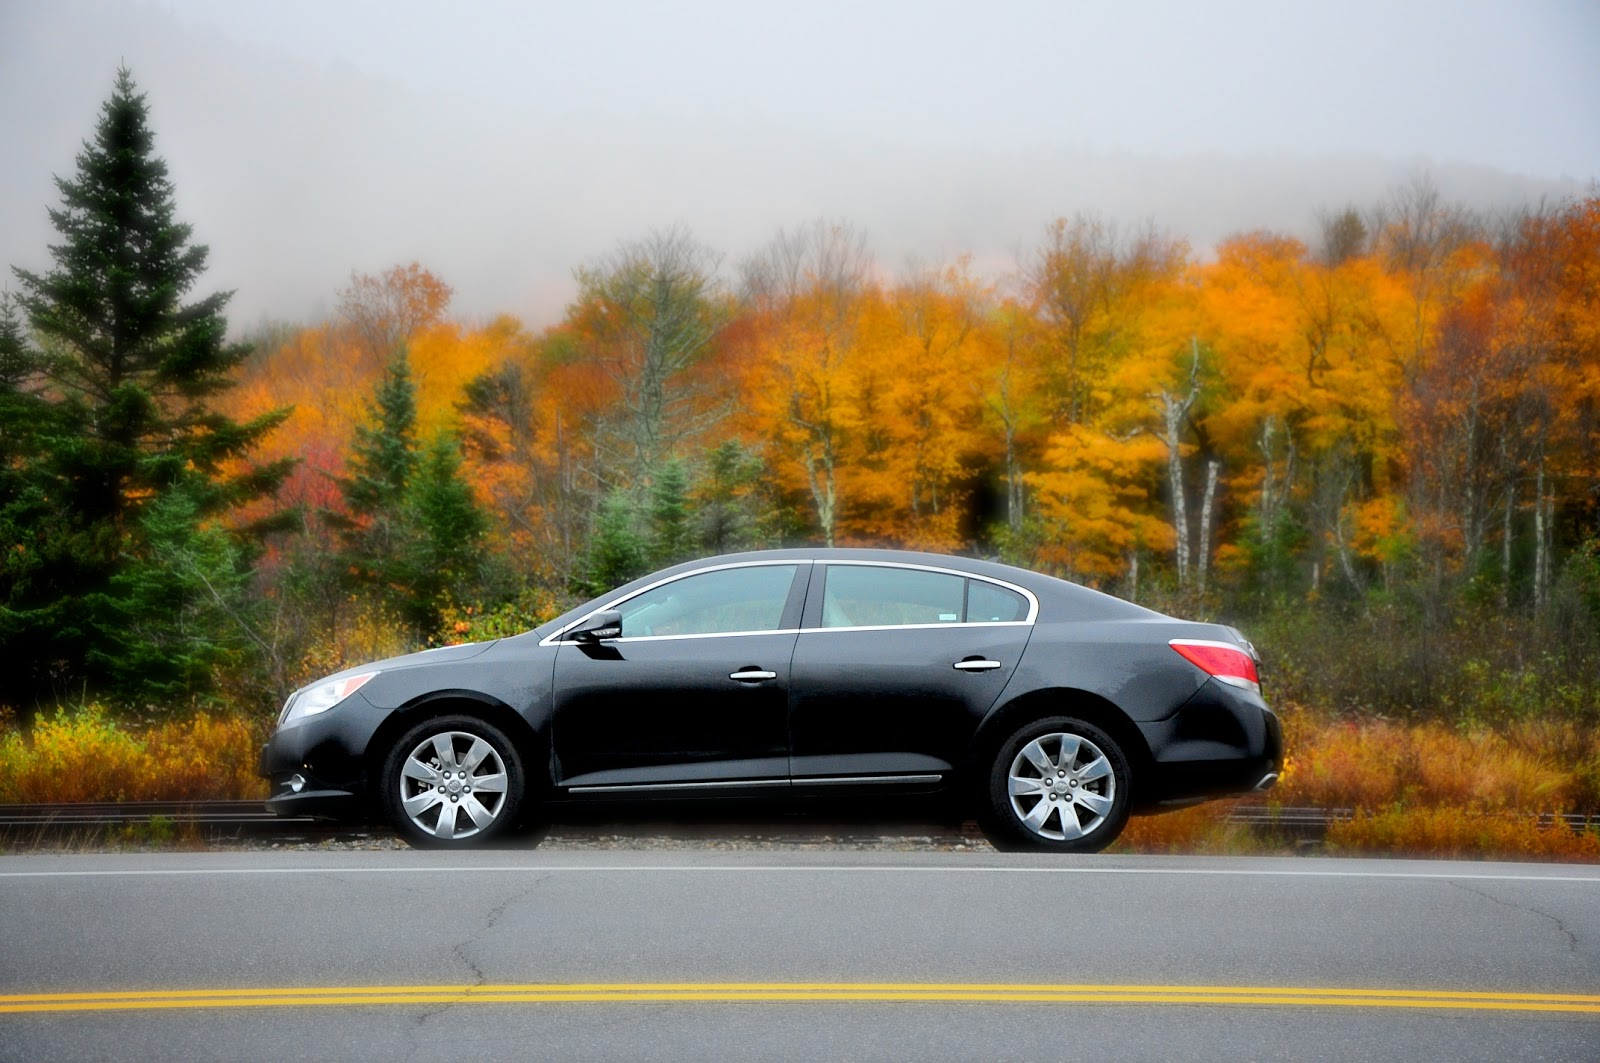 d647b6f84904 Fall foliage trip-New England region- 2012 – familyonafurlough